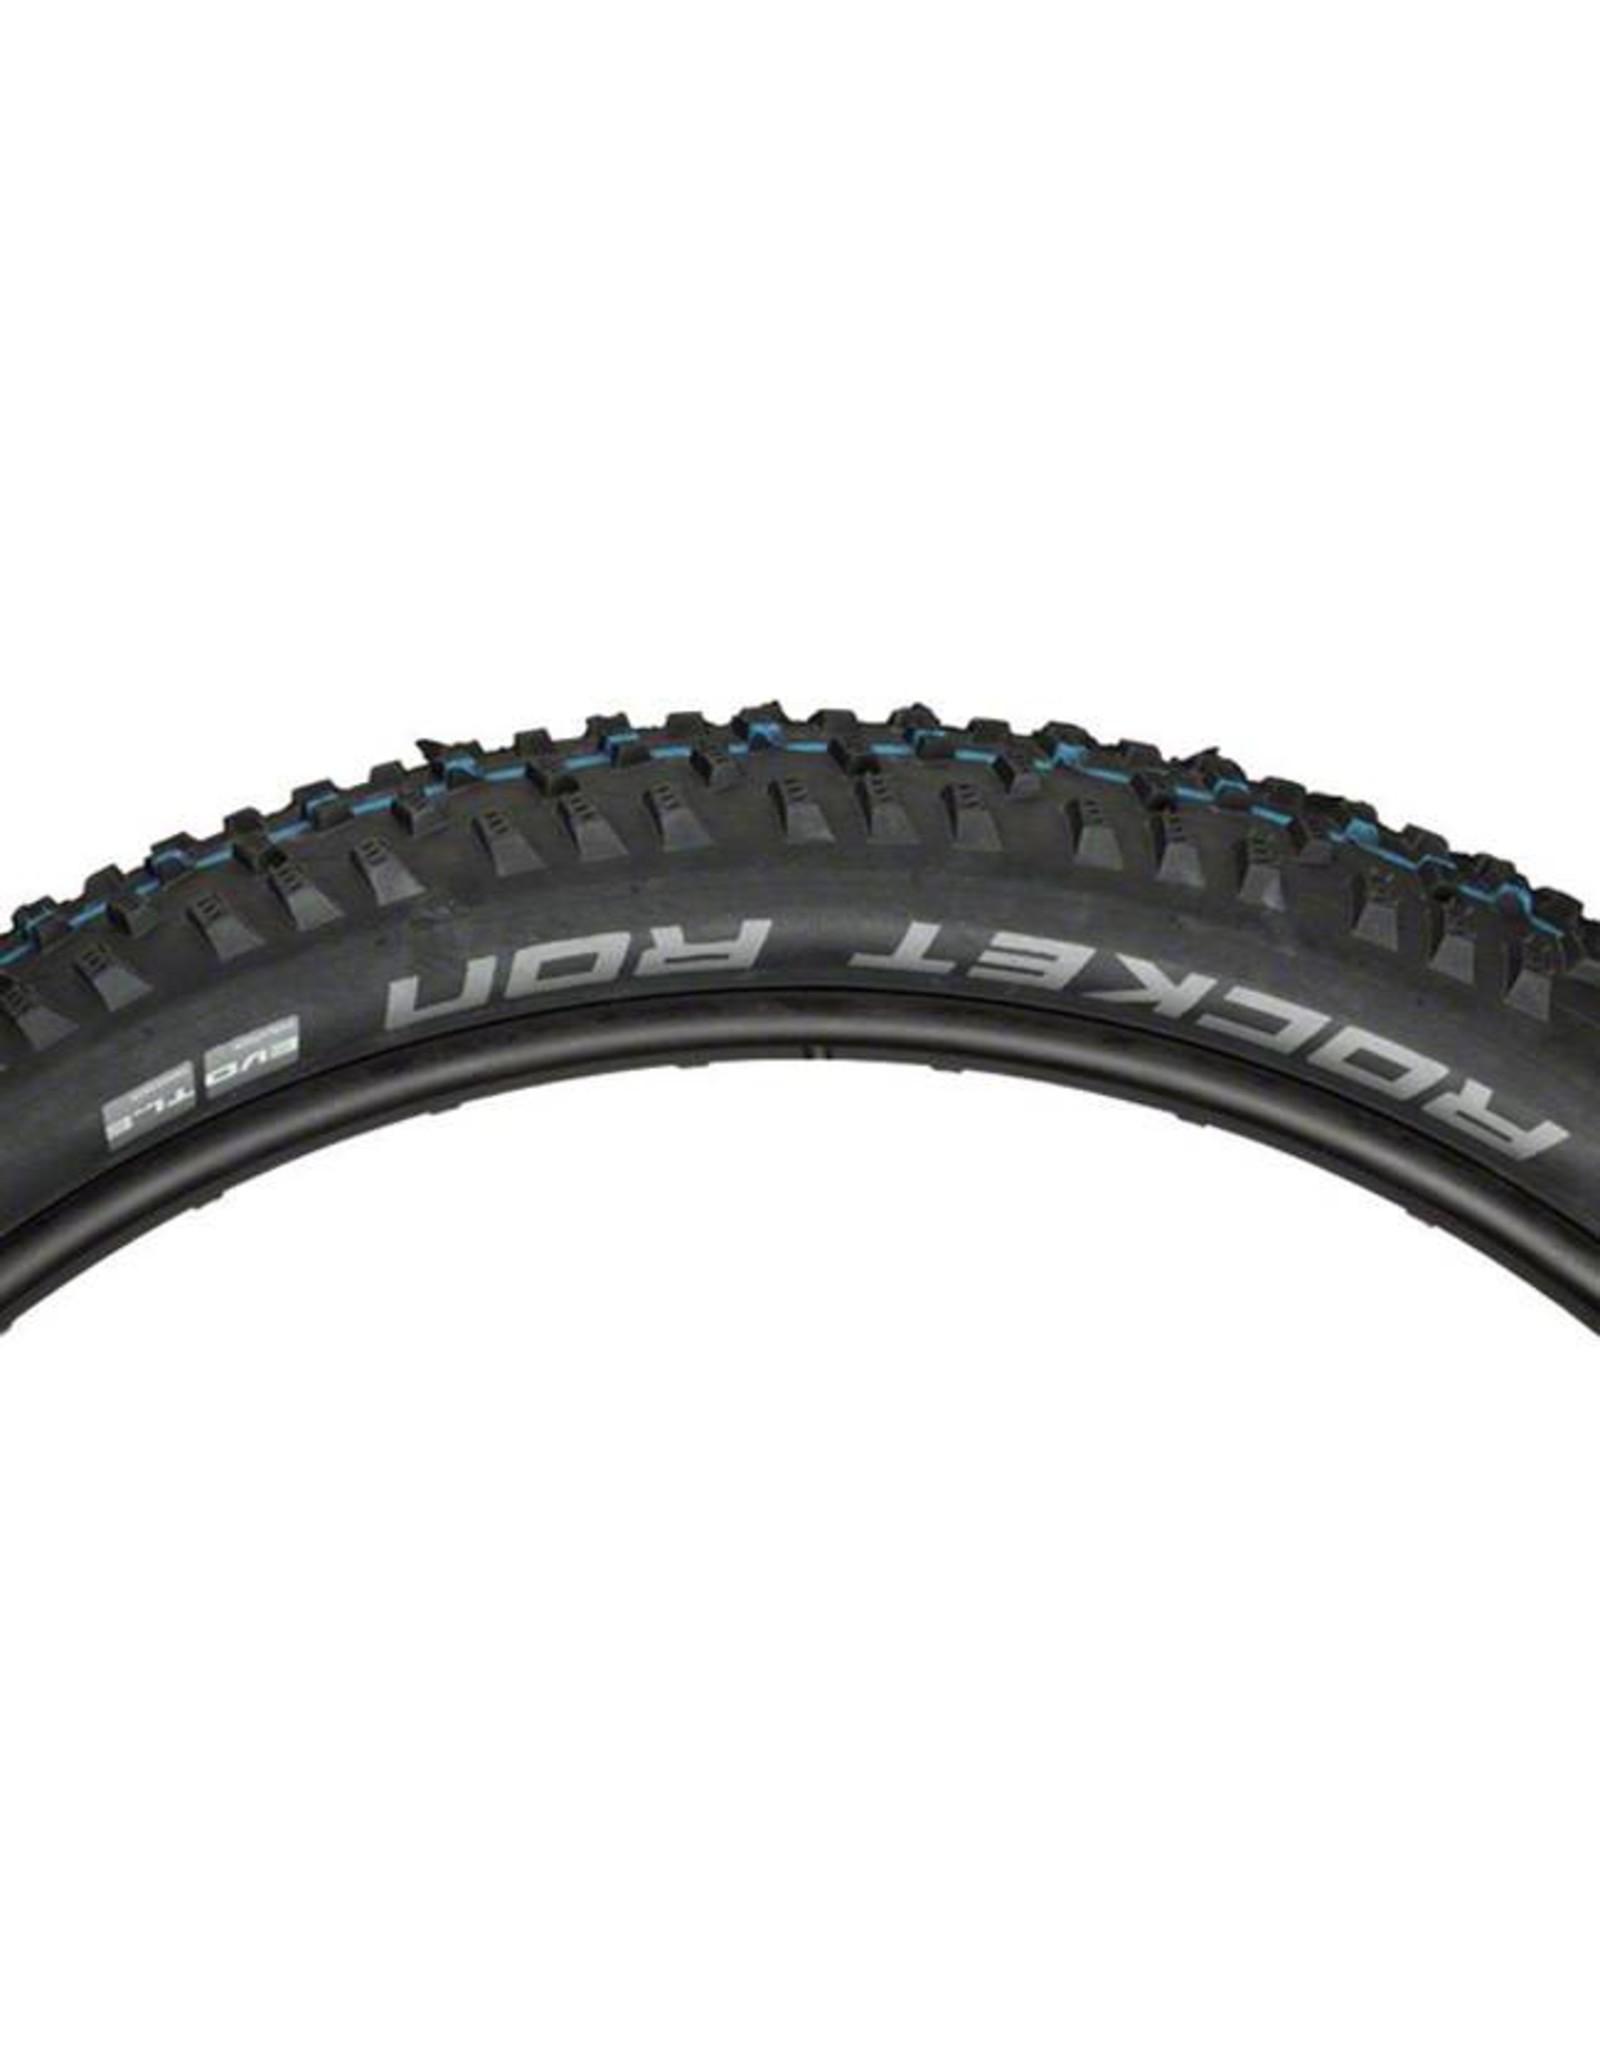 "Schwalbe Schwalbe Rocket Ron Tire: 27.5 x 2.80"", Folding Bead, Evolution Line, Addix Speed Compound, SnakeSkin, Tubeless Easy, Black"